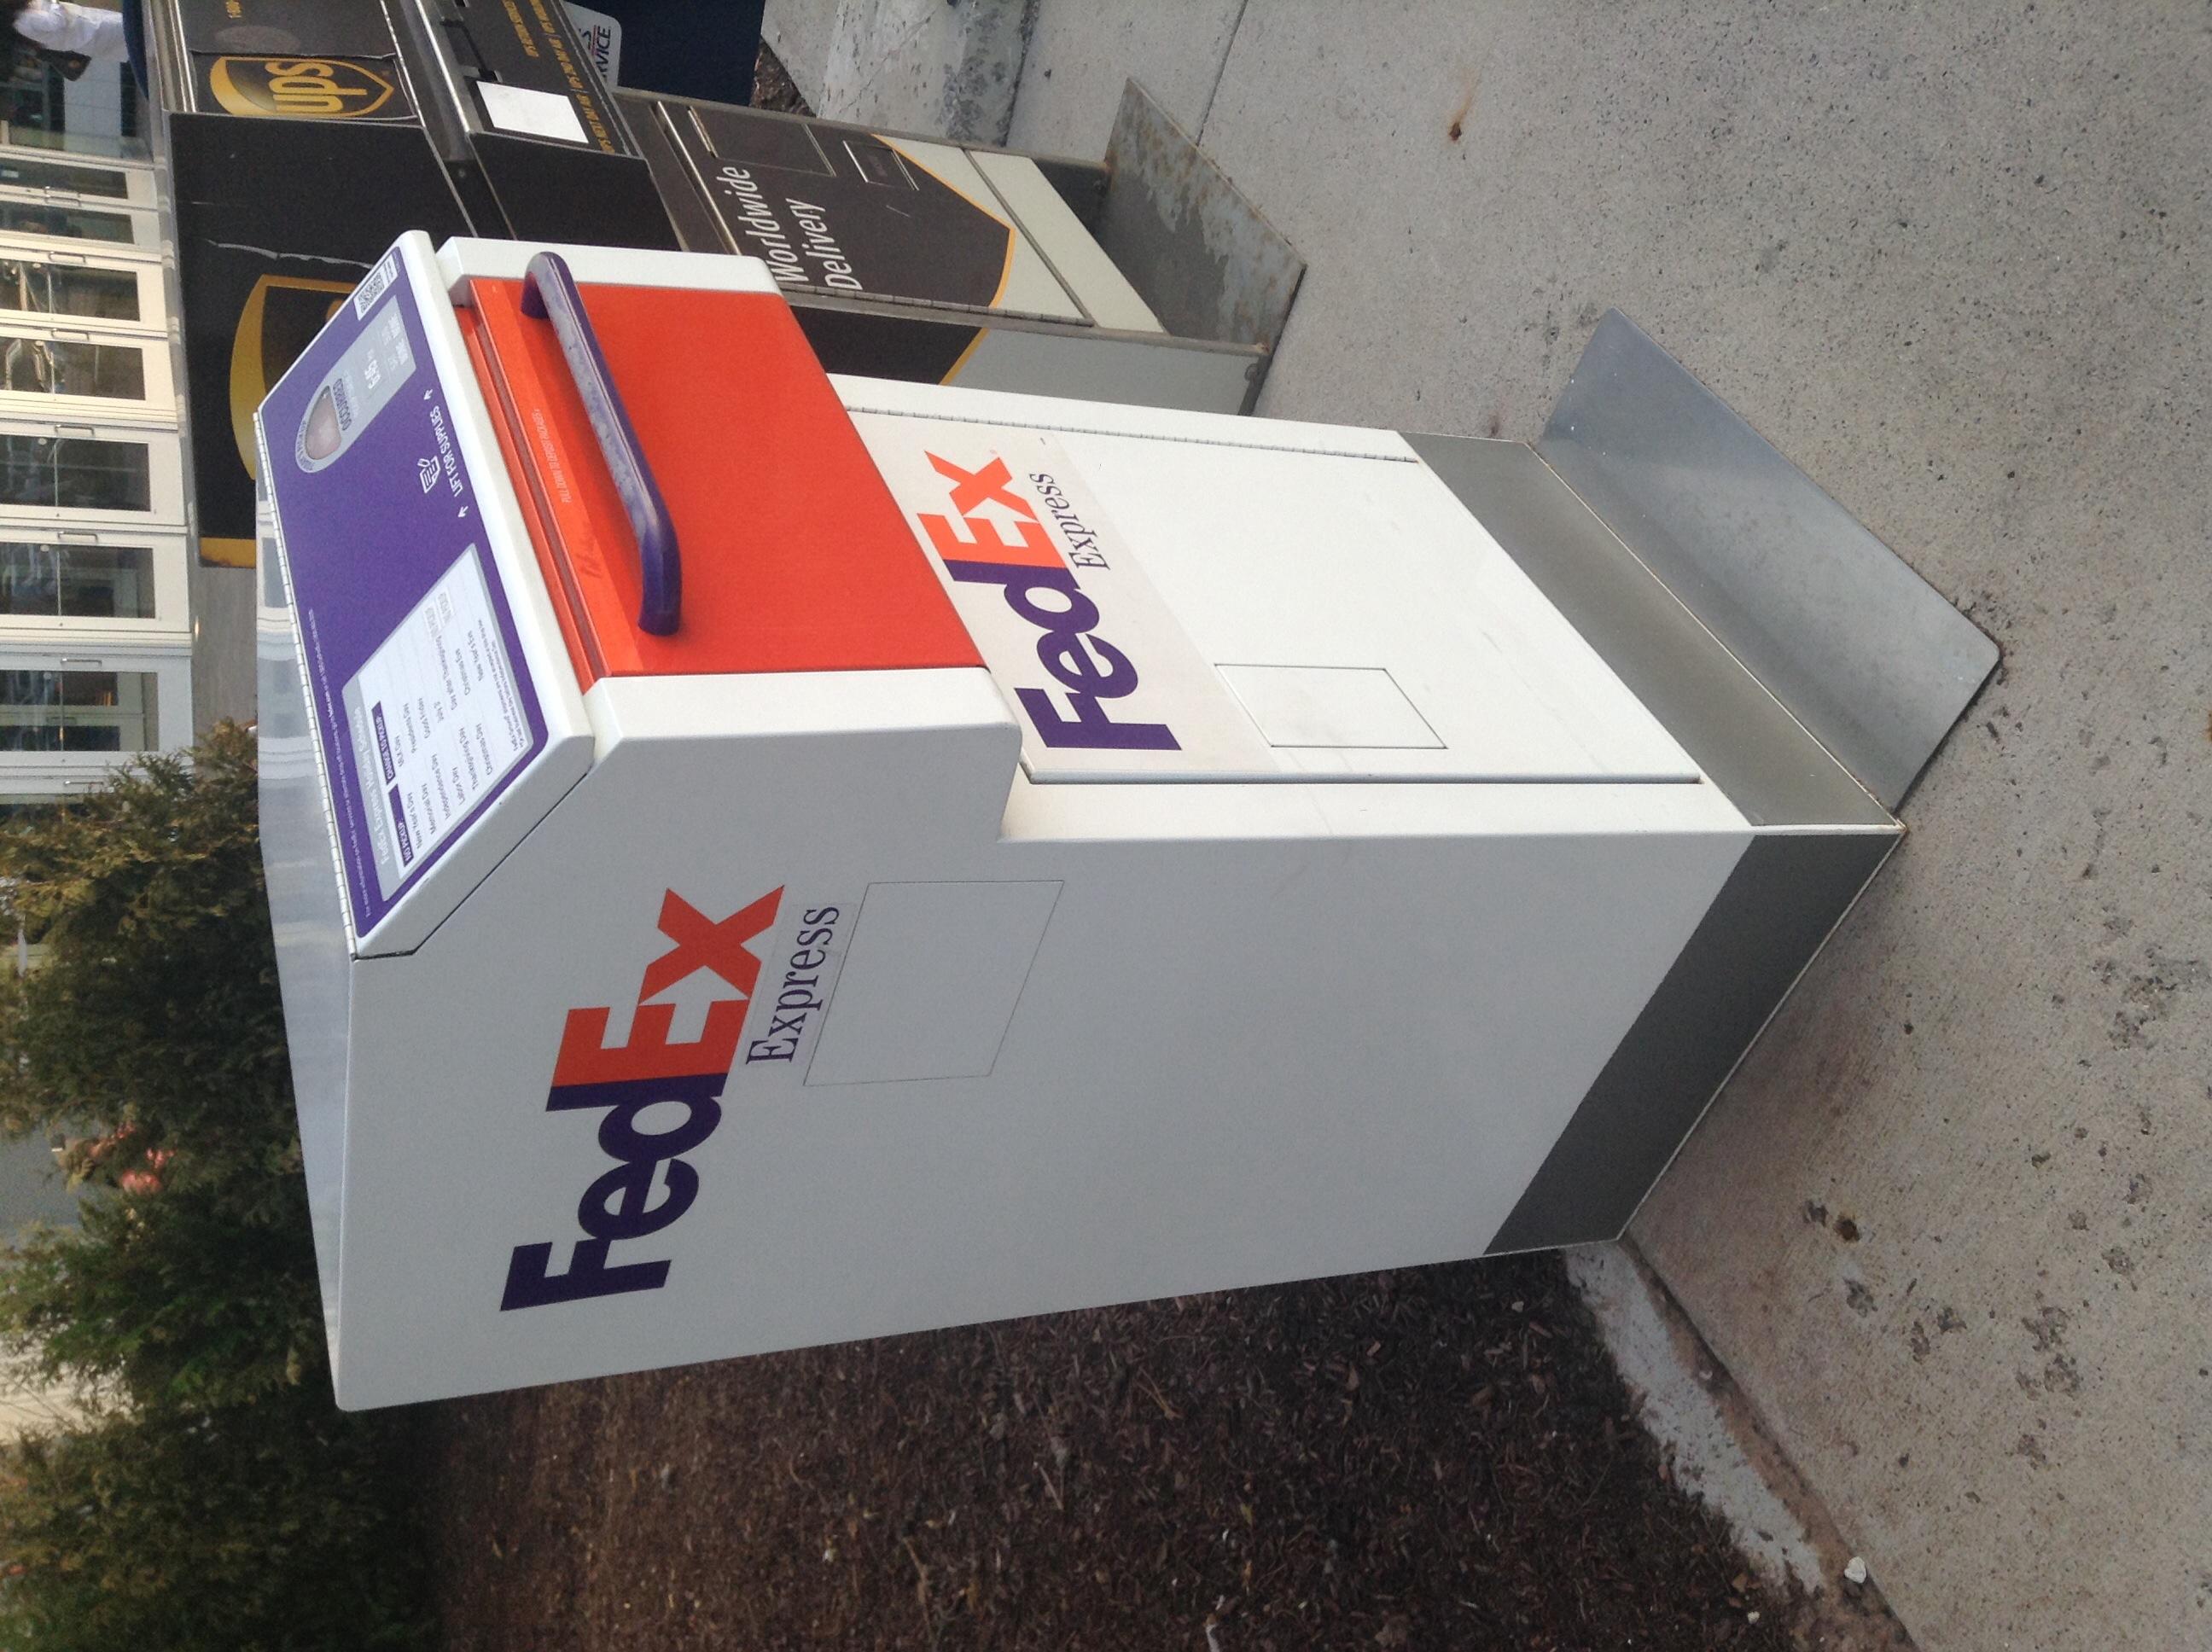 FileFedex+UPS Drop-Box.jpg & File:Fedex+UPS Drop-Box.jpg - Wikimedia Commons Aboutintivar.Com